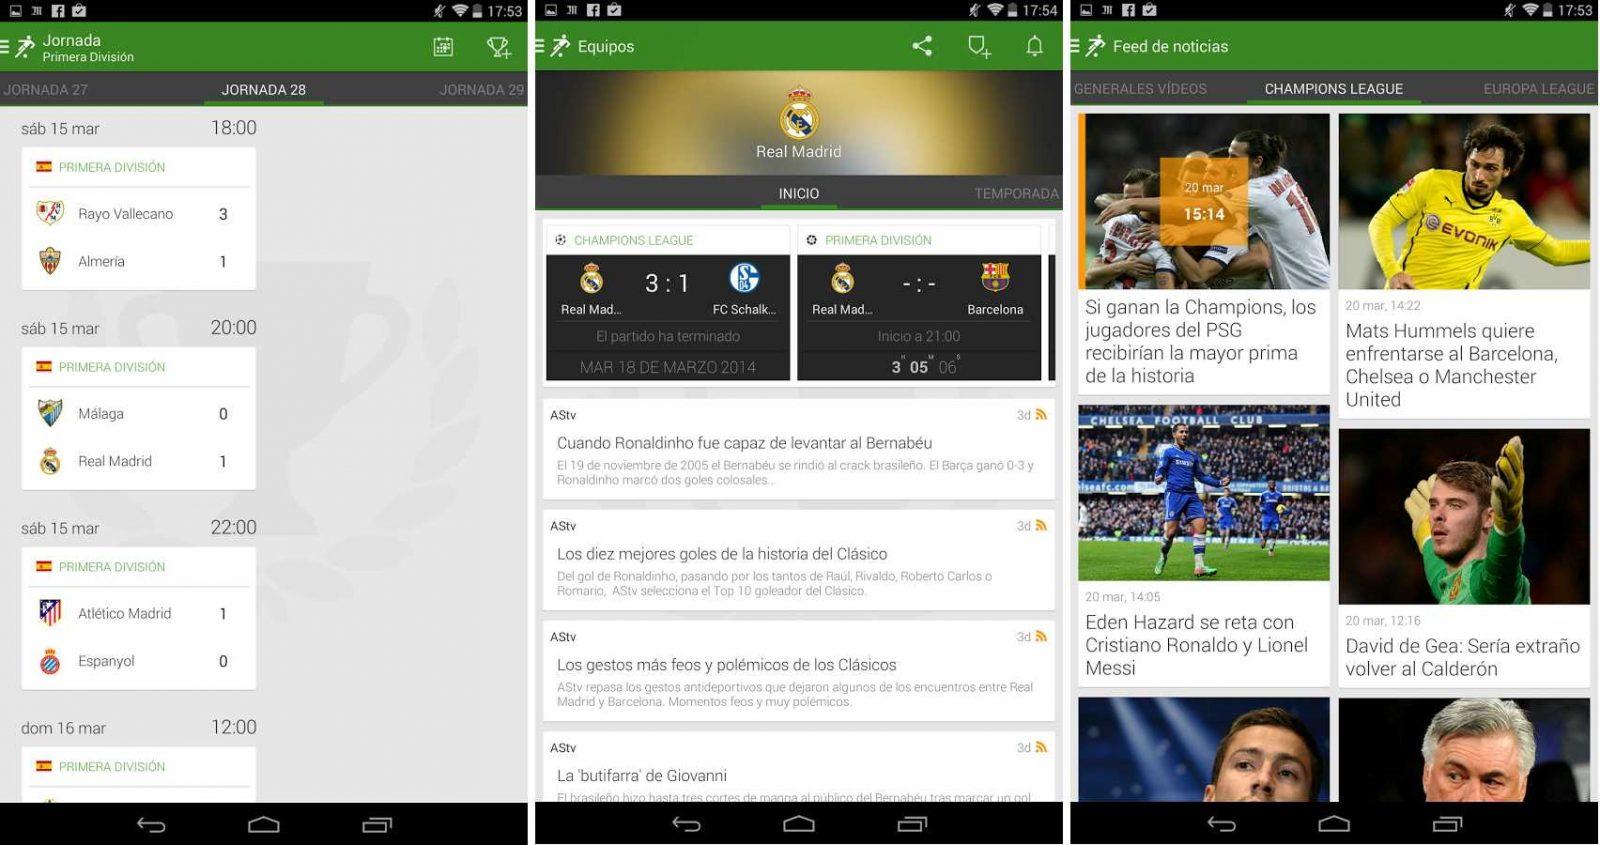 Noticias app for android chile news noticias android for App noticias android